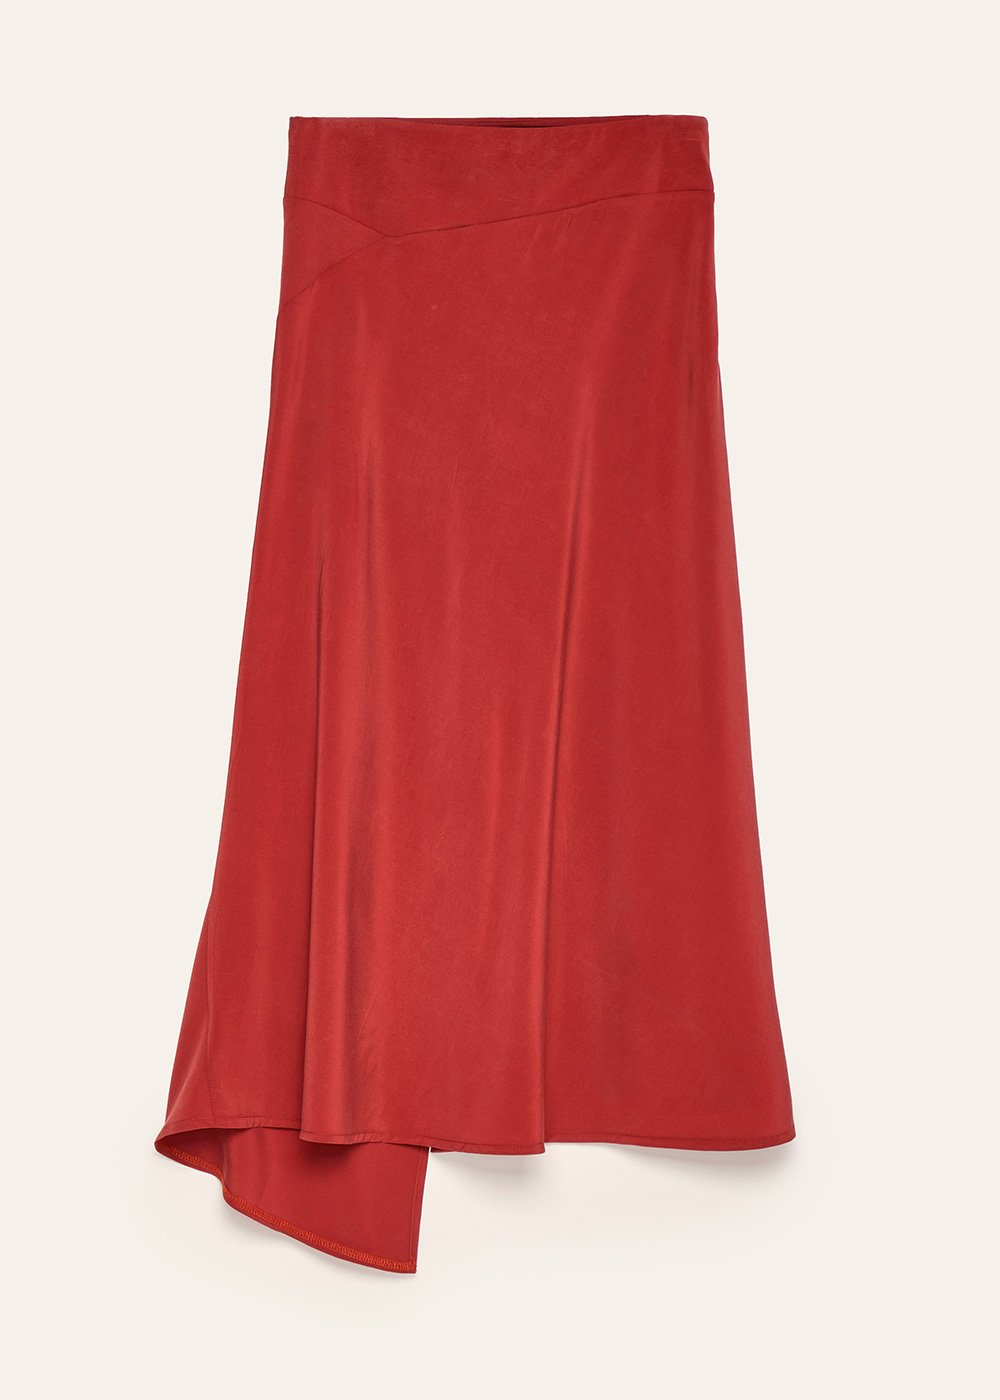 Scarlett rayon skirt with slit - Anemone - Woman